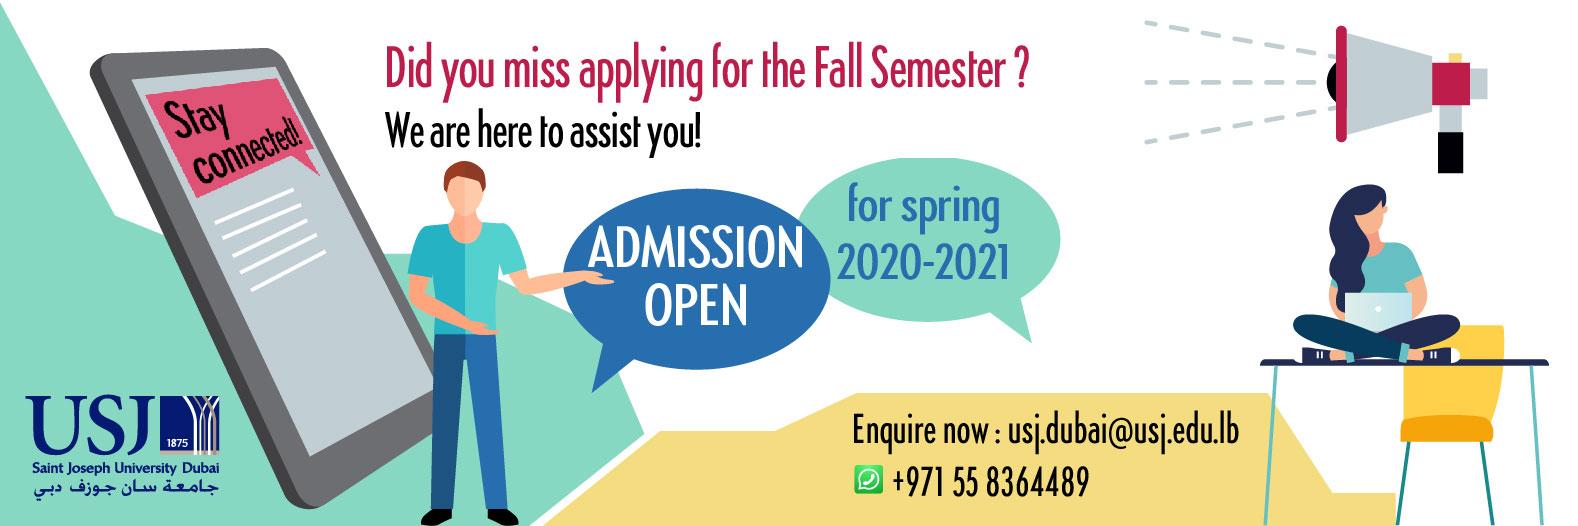 Spring Admission - Saint Joseph University - Dubai